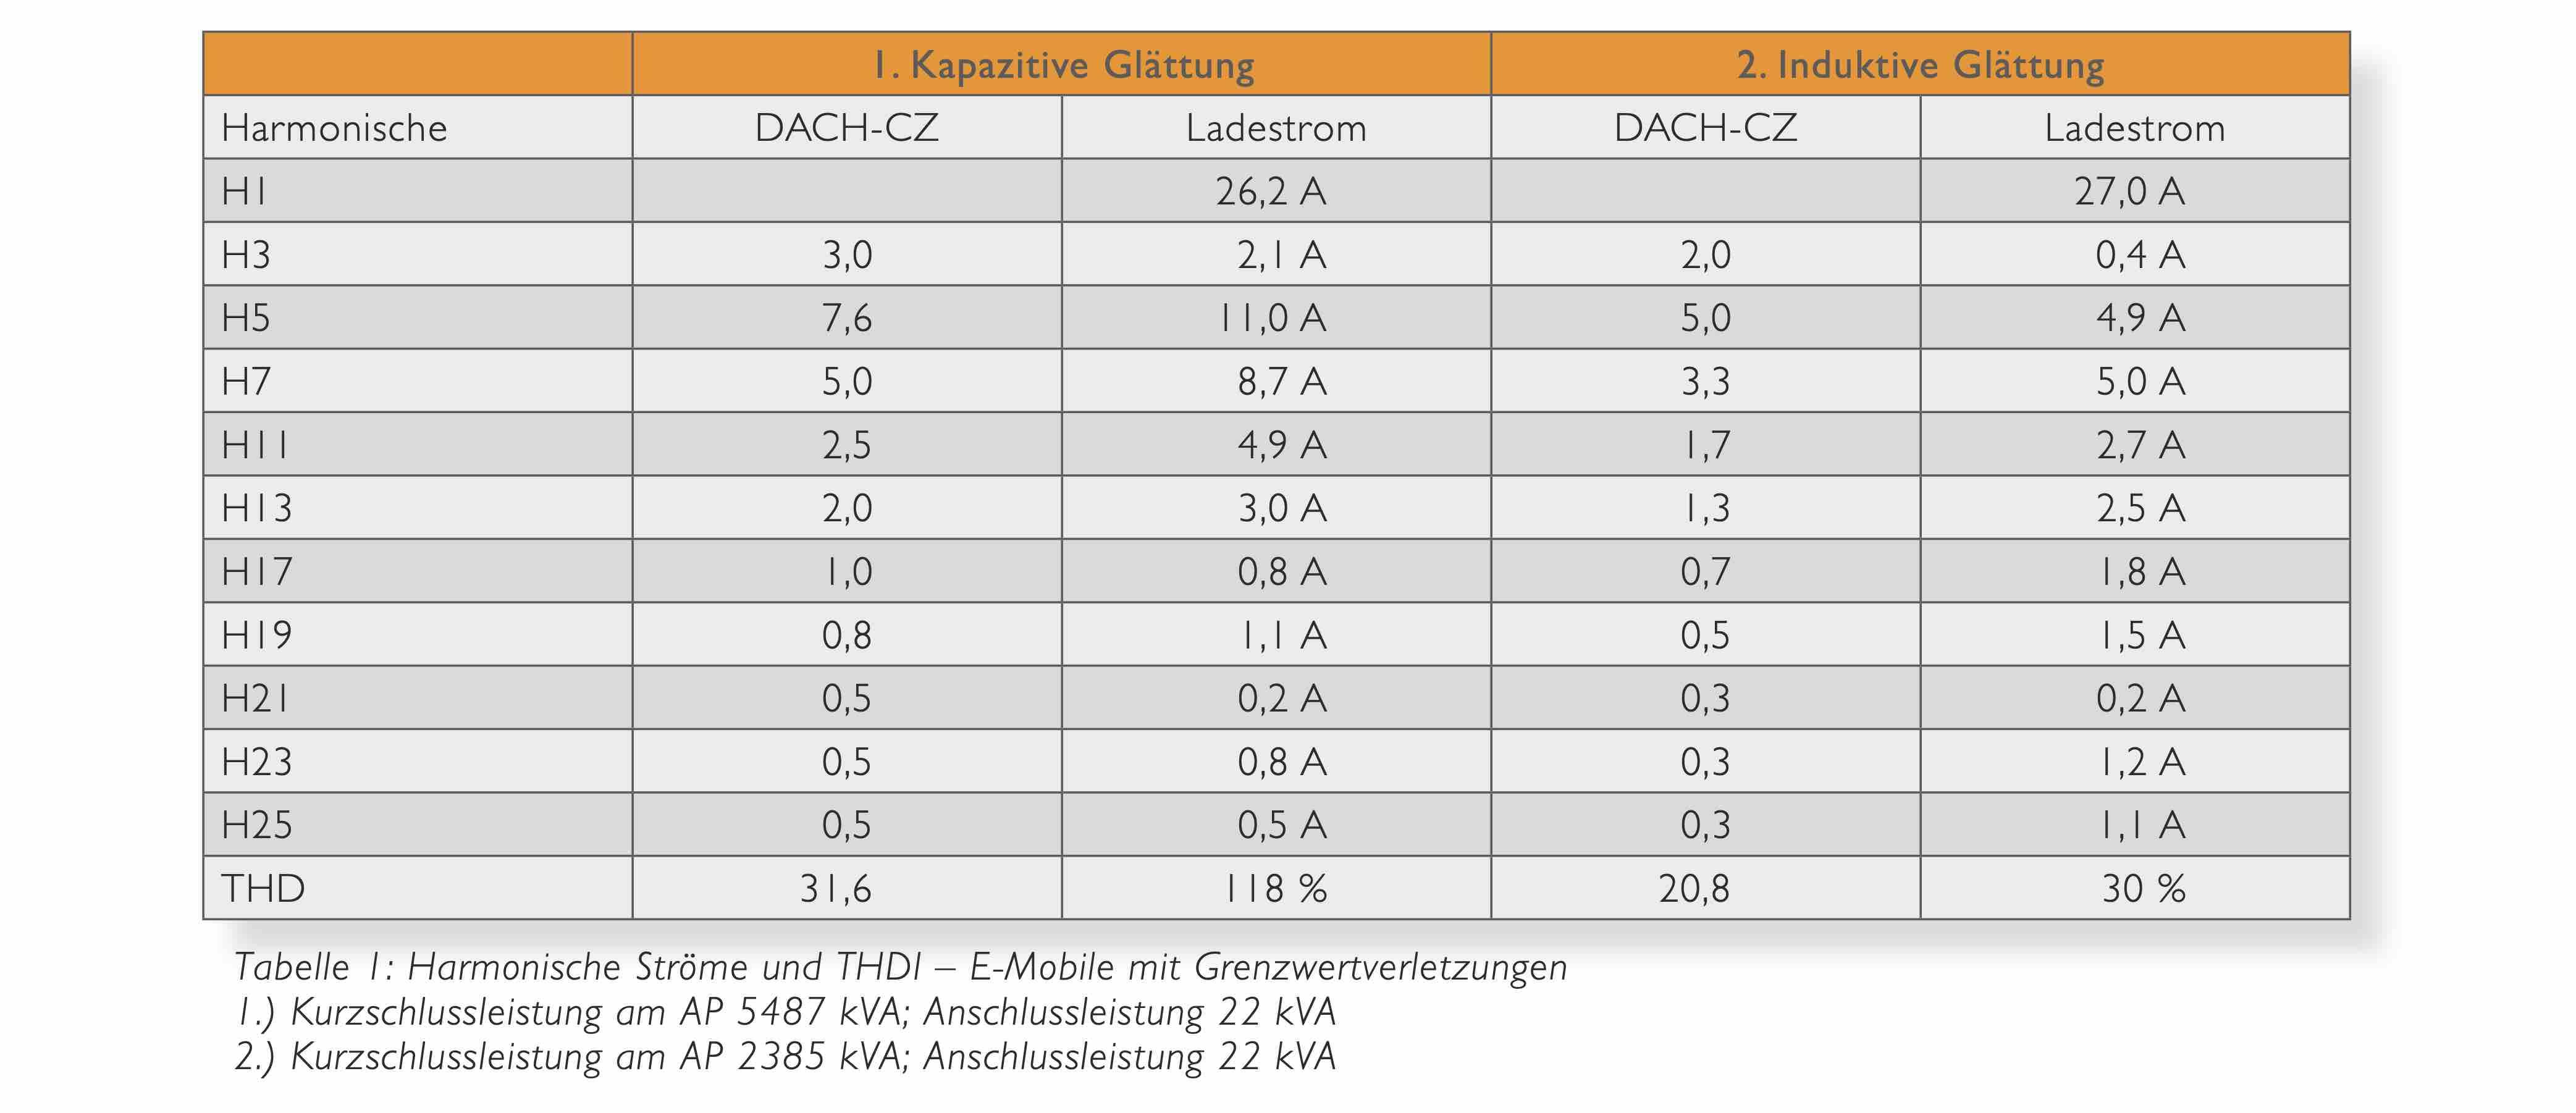 Power Quality, E-Mobility, E Mobility, Elektroauto, Elektrofahrzeug, Ladestation, Oberschwingungen, Supraharmonische, A-eberle, E. Eberle, Störschreiber